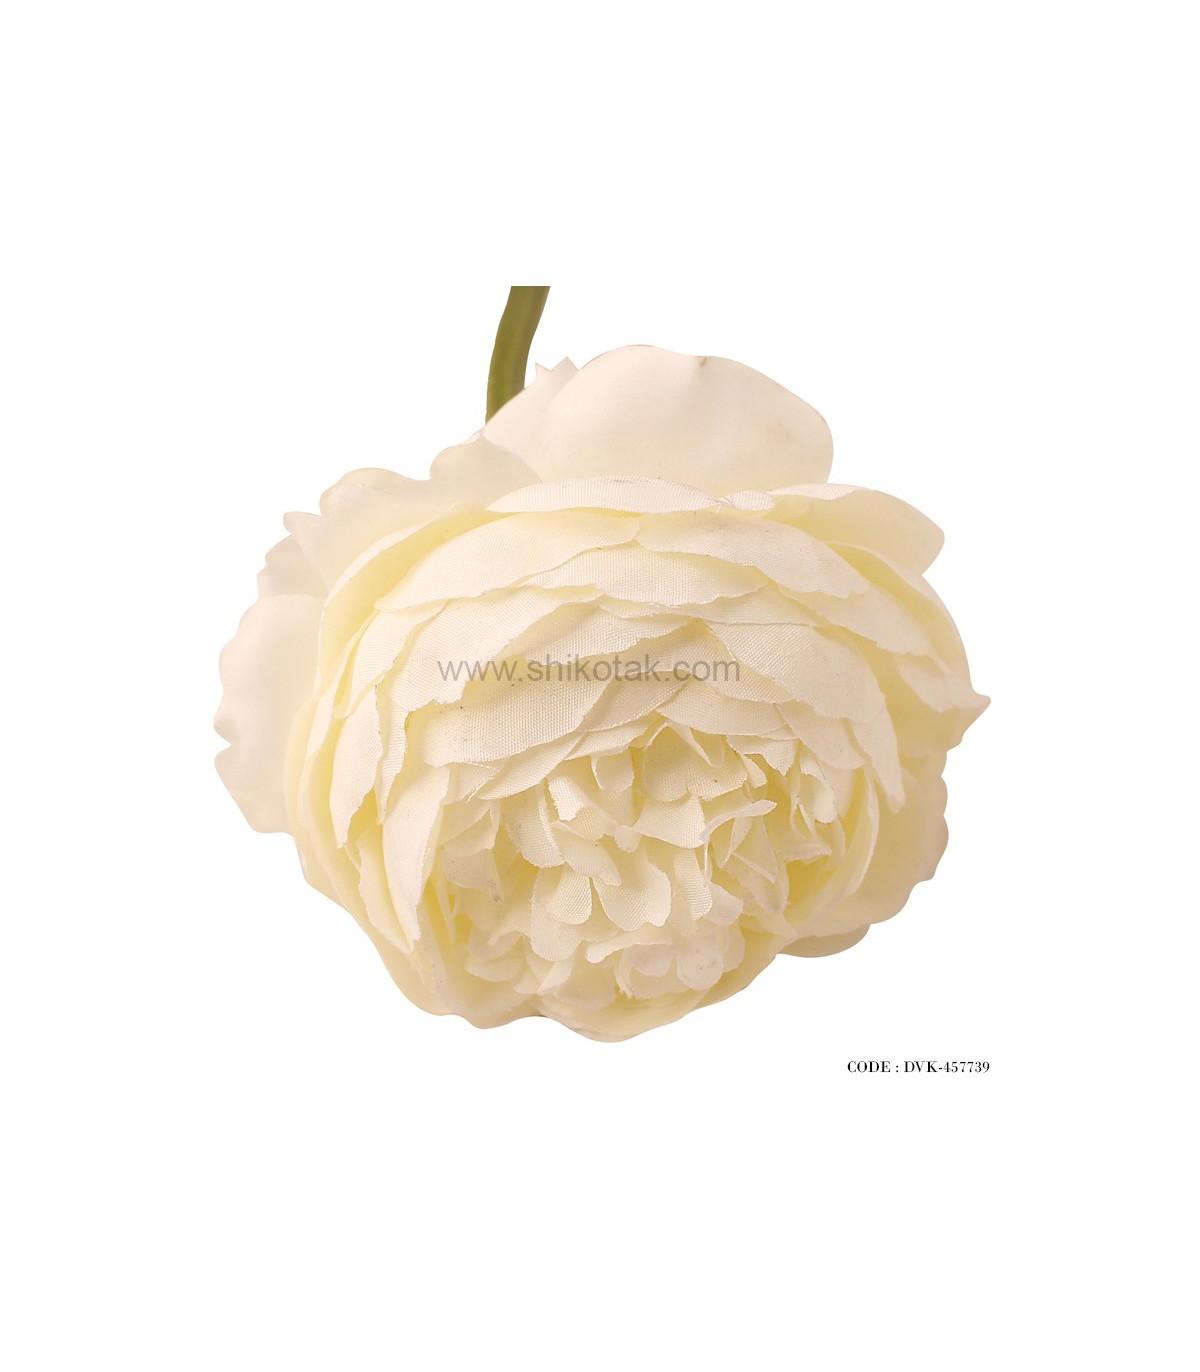 گل رز مصنوعی